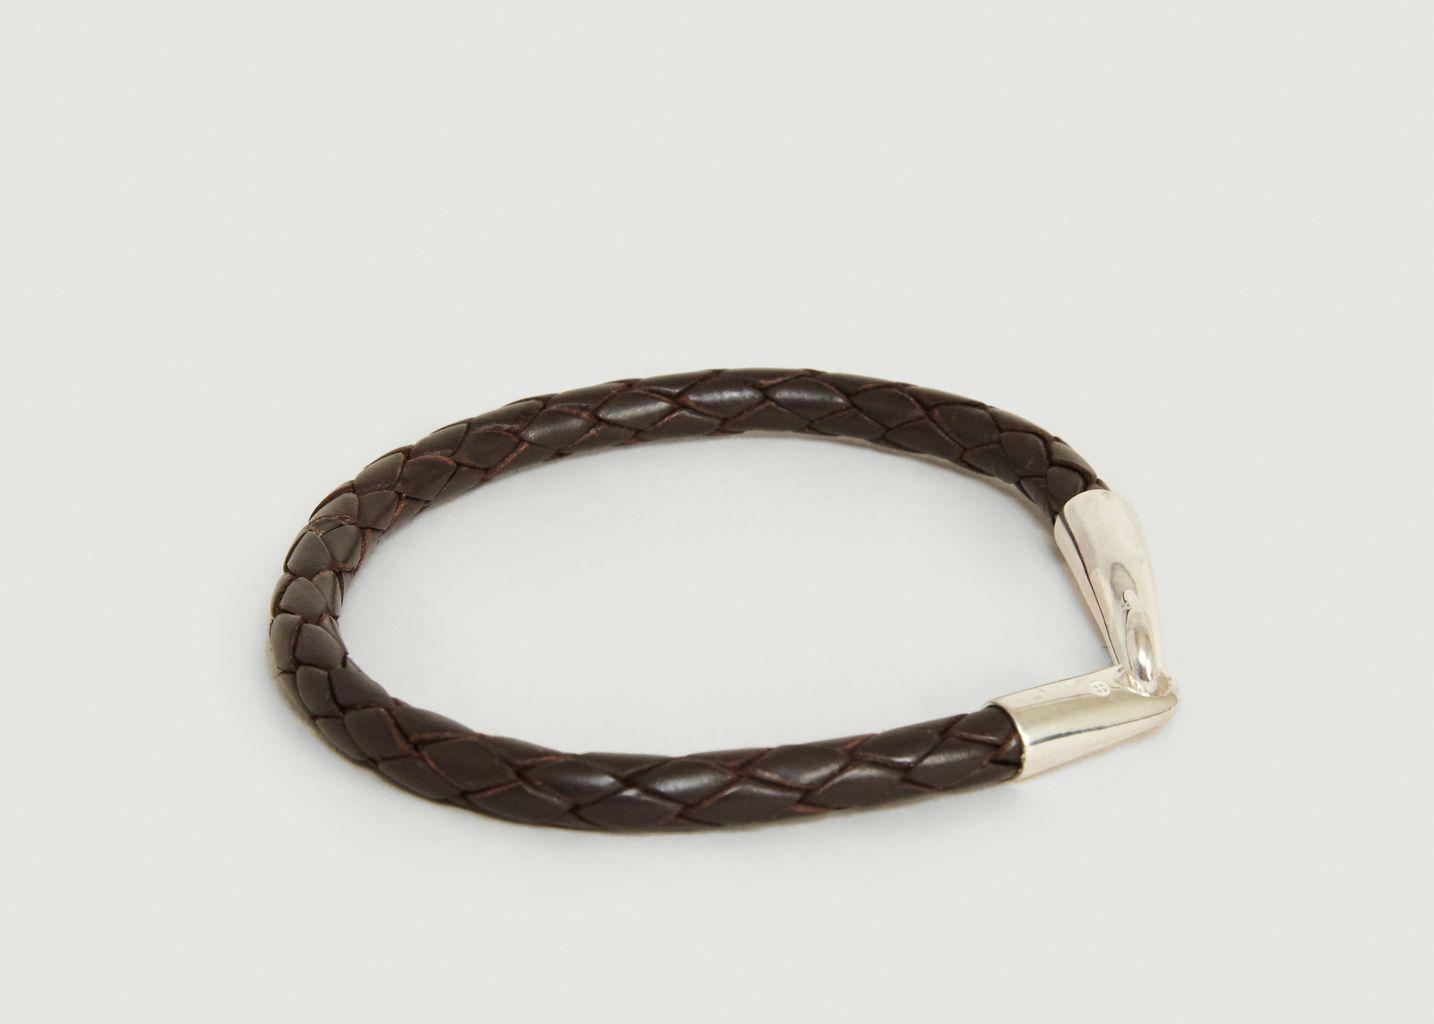 Bracelet Cuir Tressé - Orner